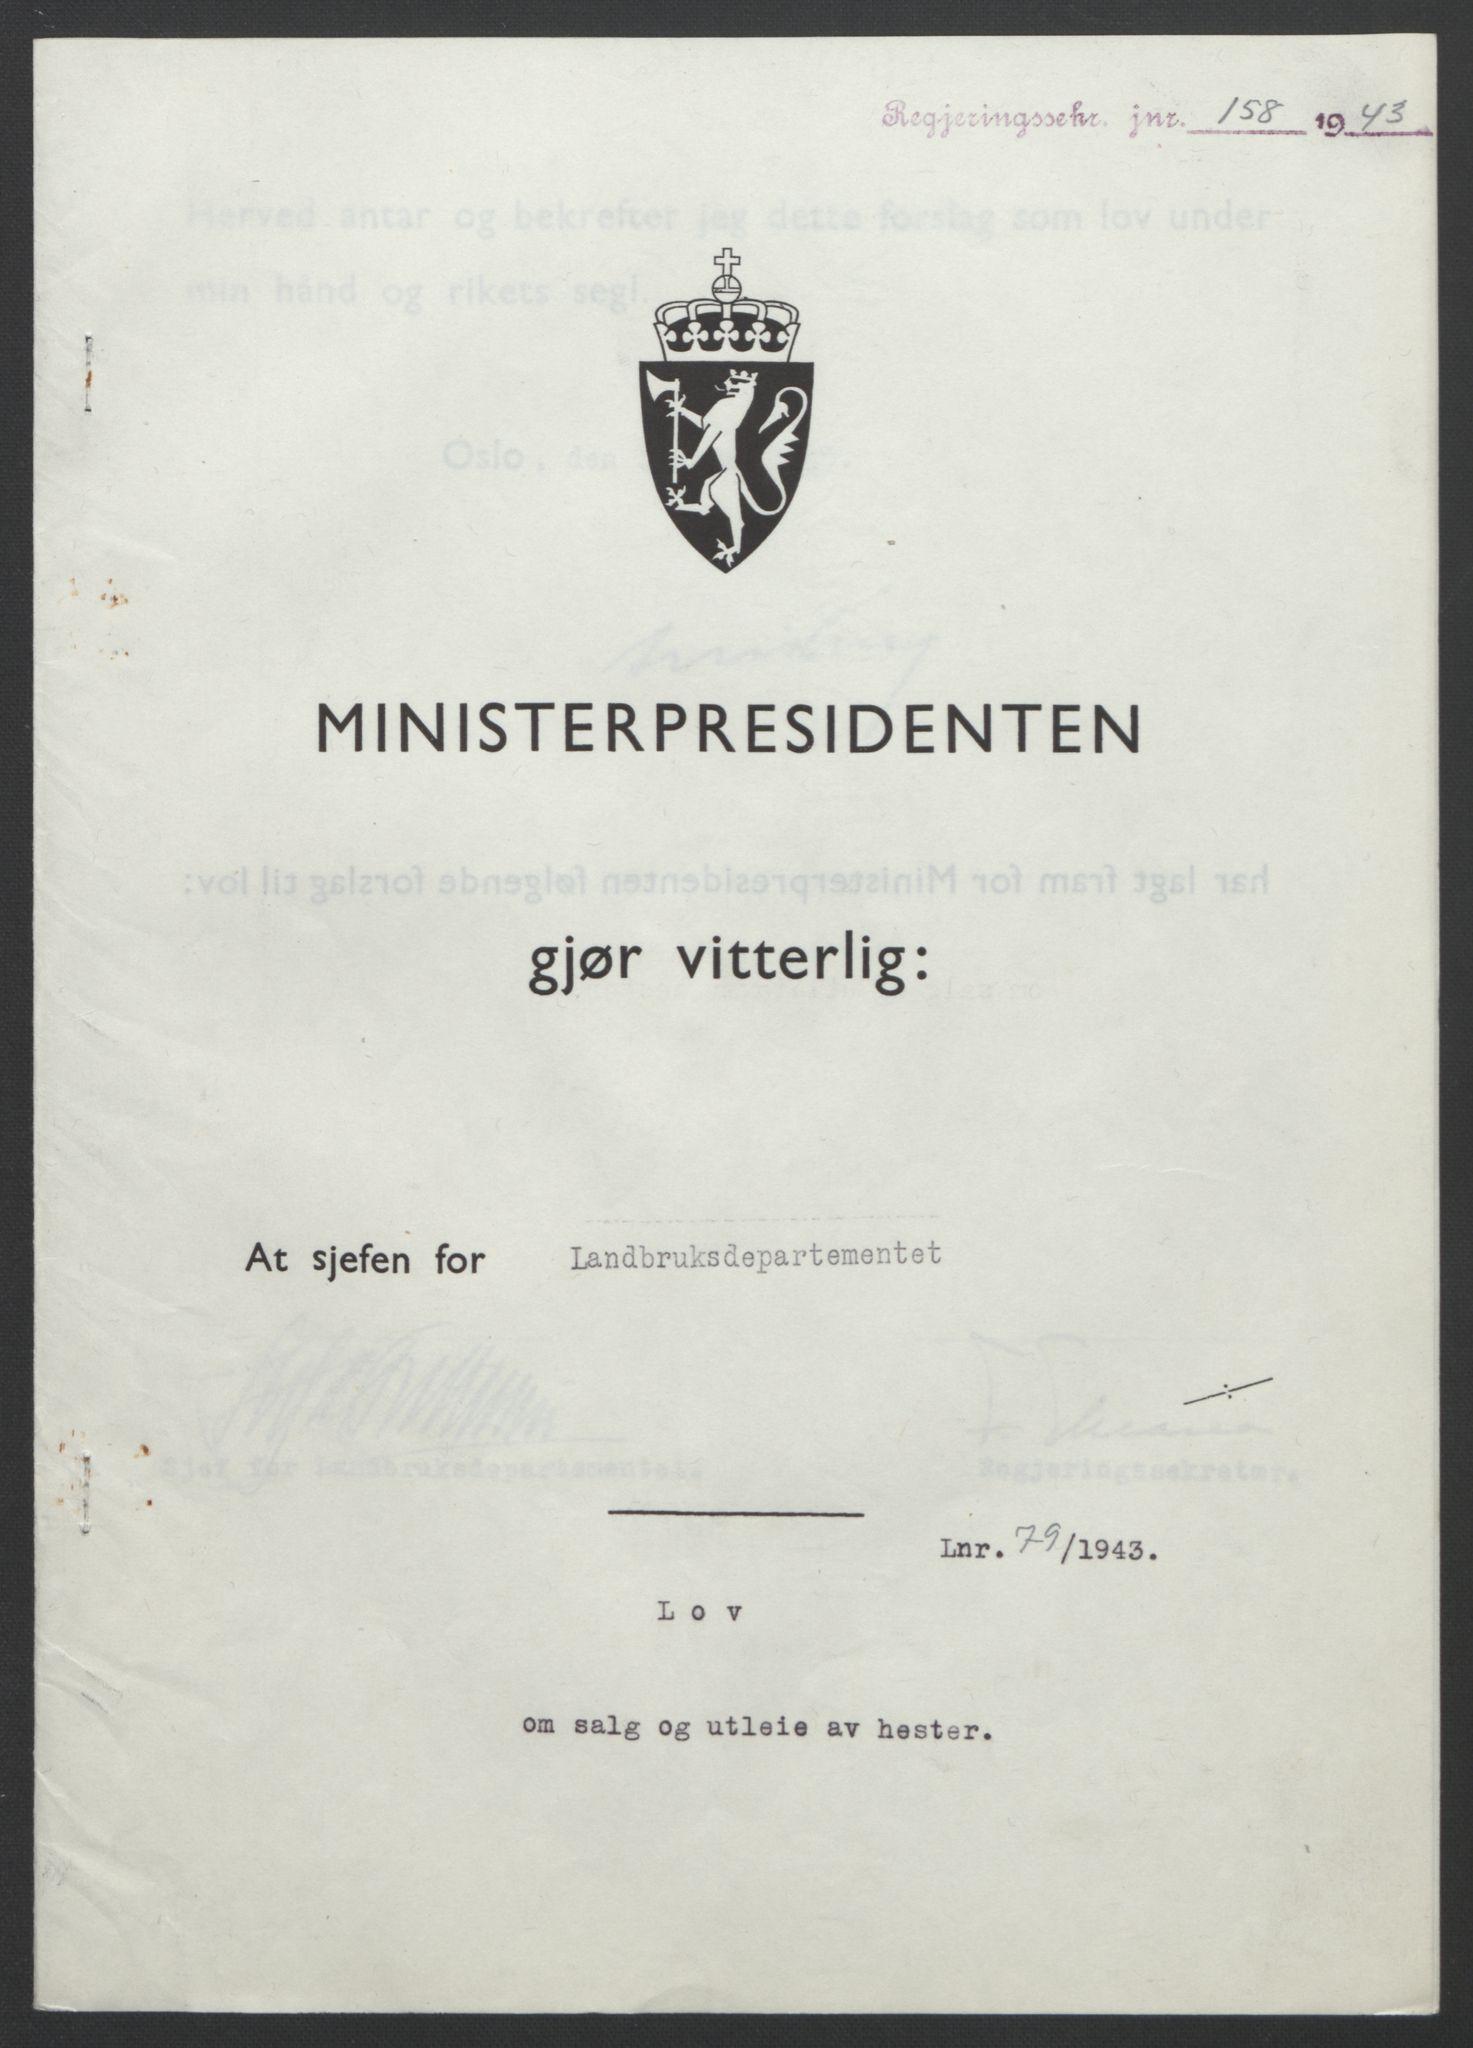 RA, NS-administrasjonen 1940-1945 (Statsrådsekretariatet, de kommisariske statsråder mm), D/Db/L0099: Lover, 1943, s. 361